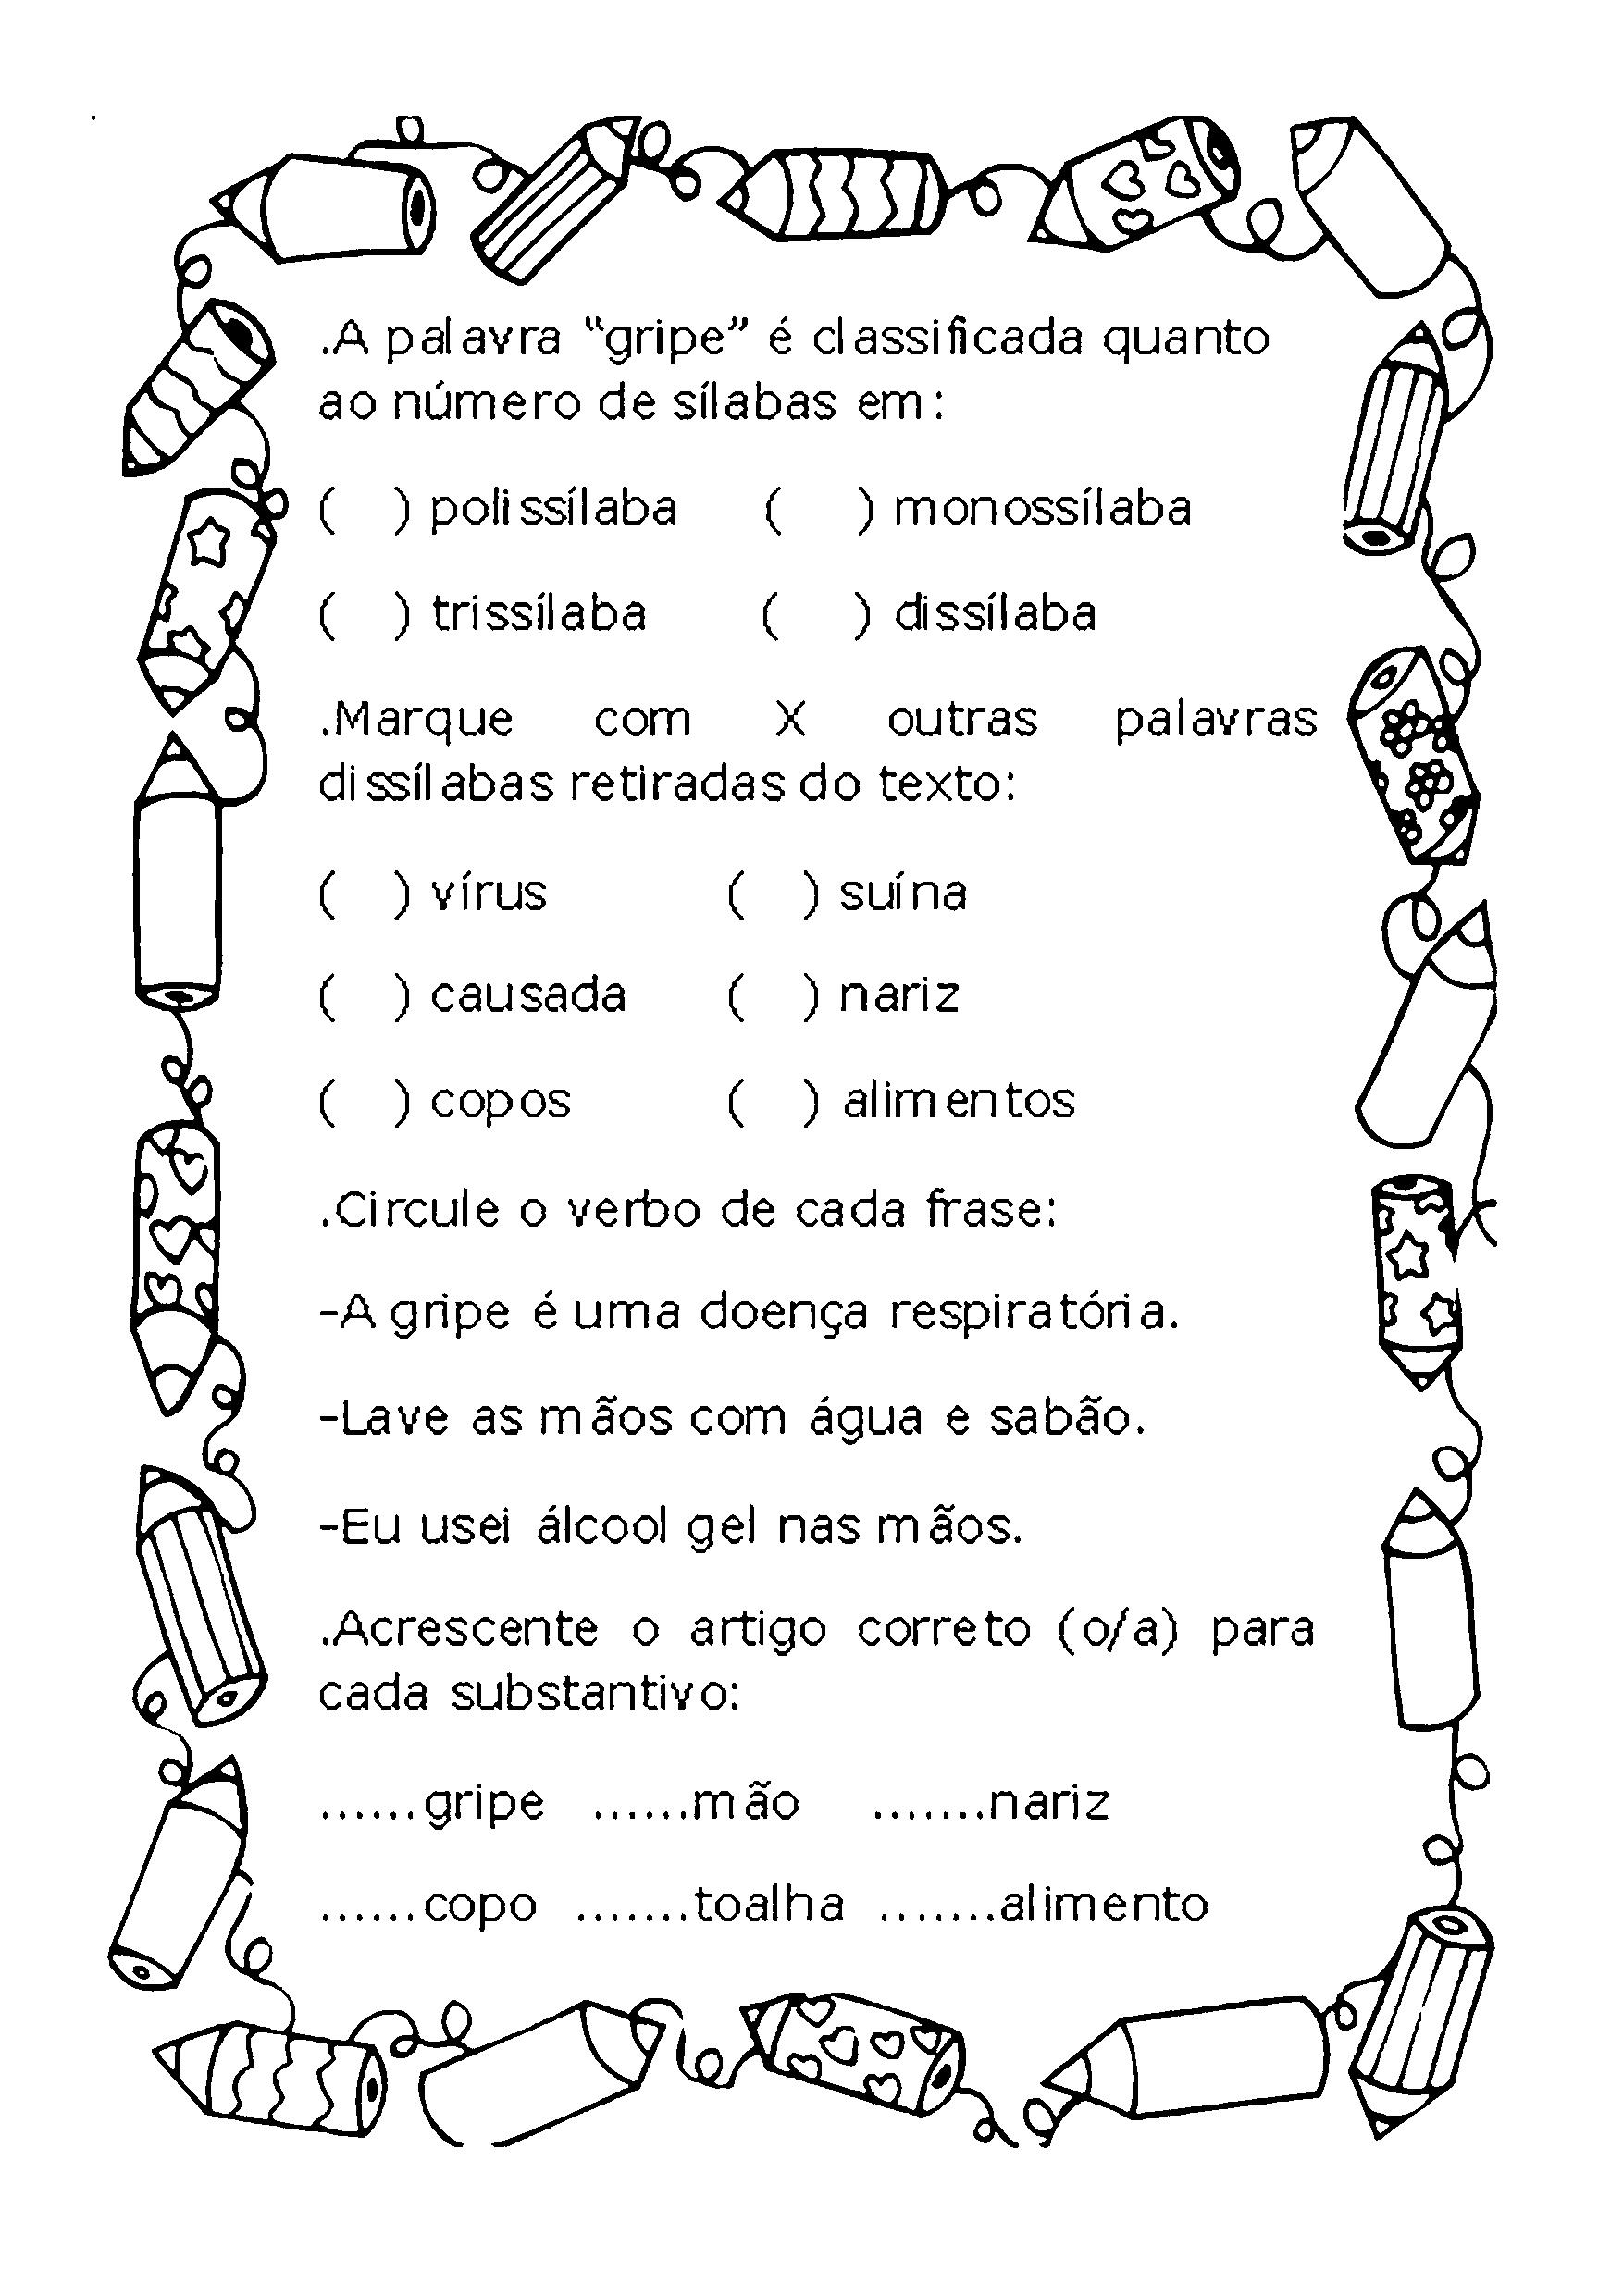 cfd verbot esma top-borker für binäre optionen